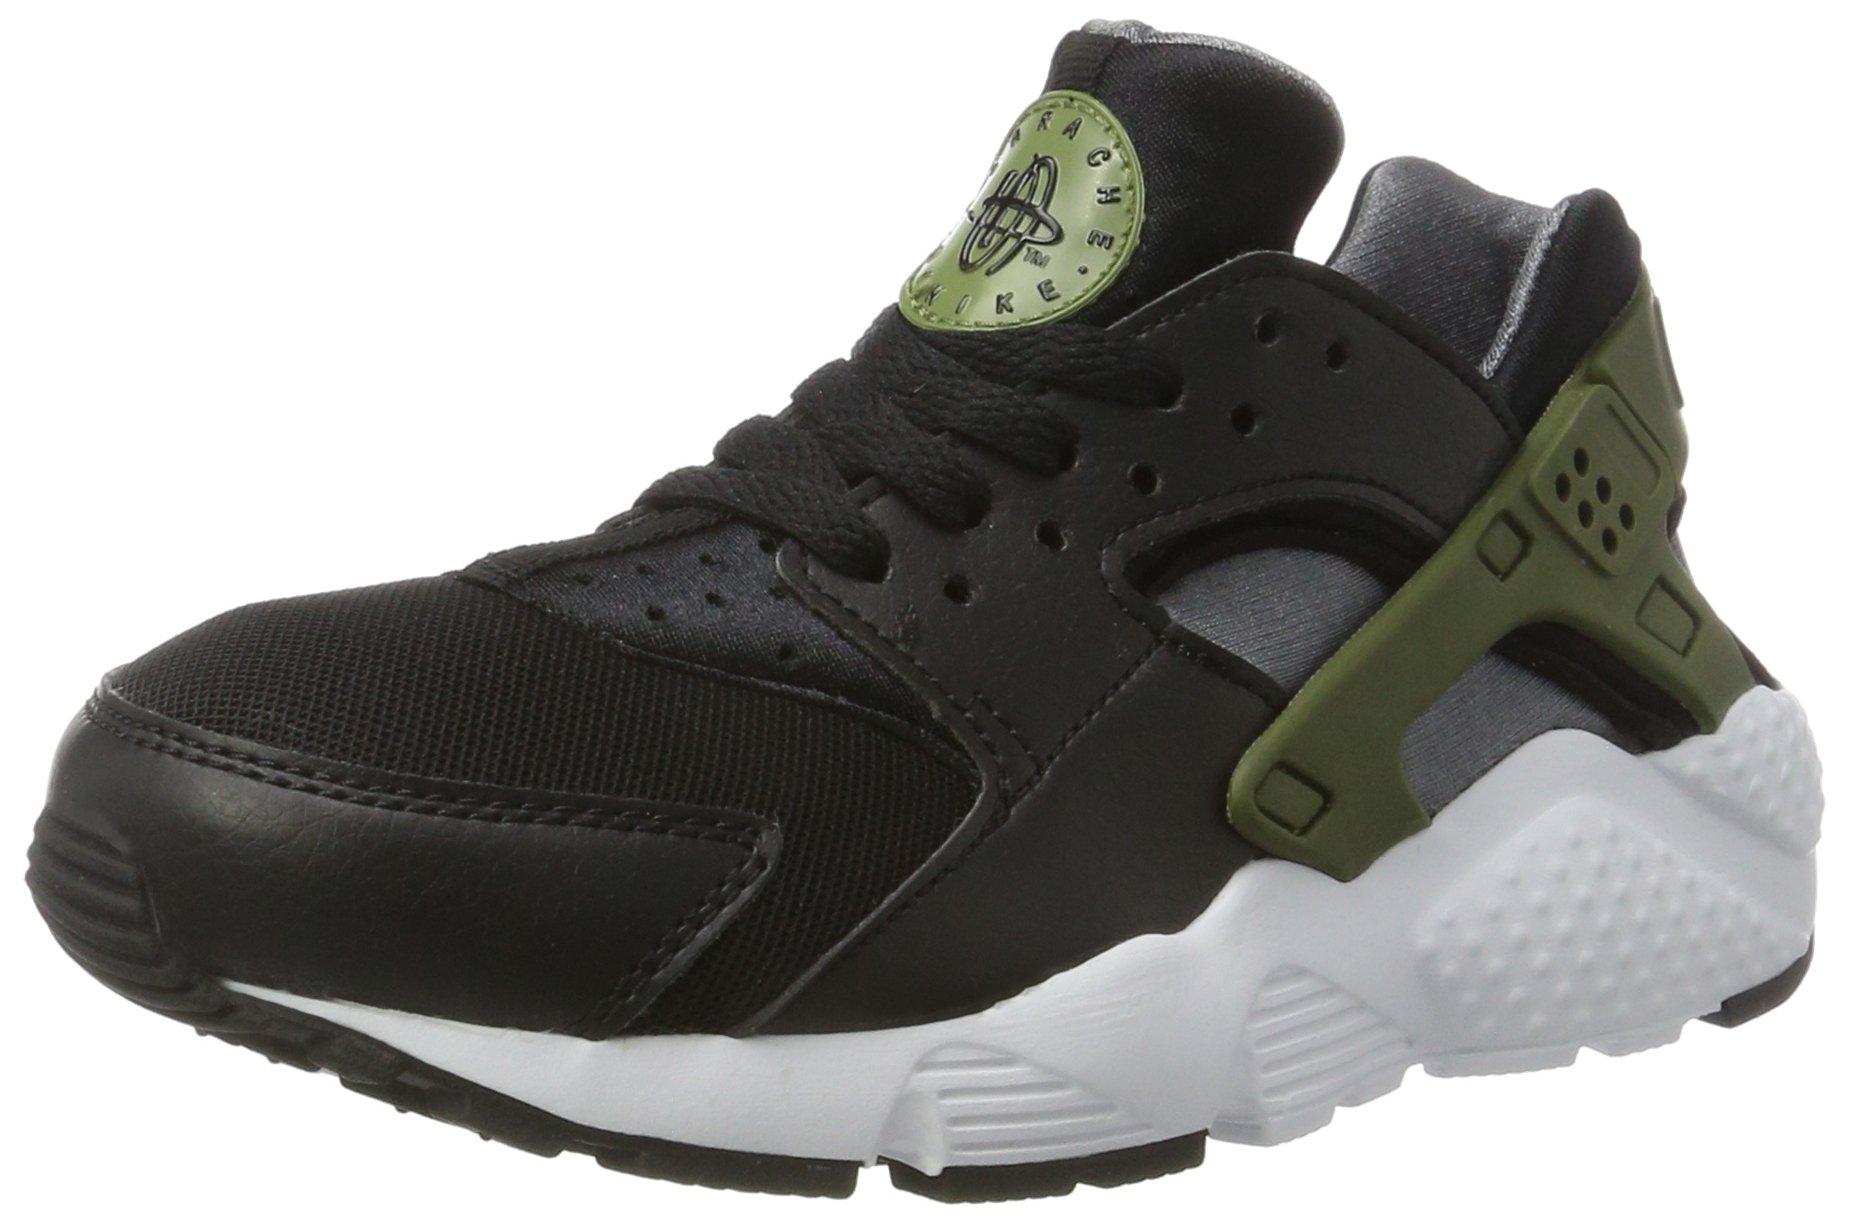 new product 430a0 83df9 Galleon - Nike Children And Boys Huarache Run Gs Sneakers, Multicolor (Black Palm  Green-Dark Grey-White), 4 UK